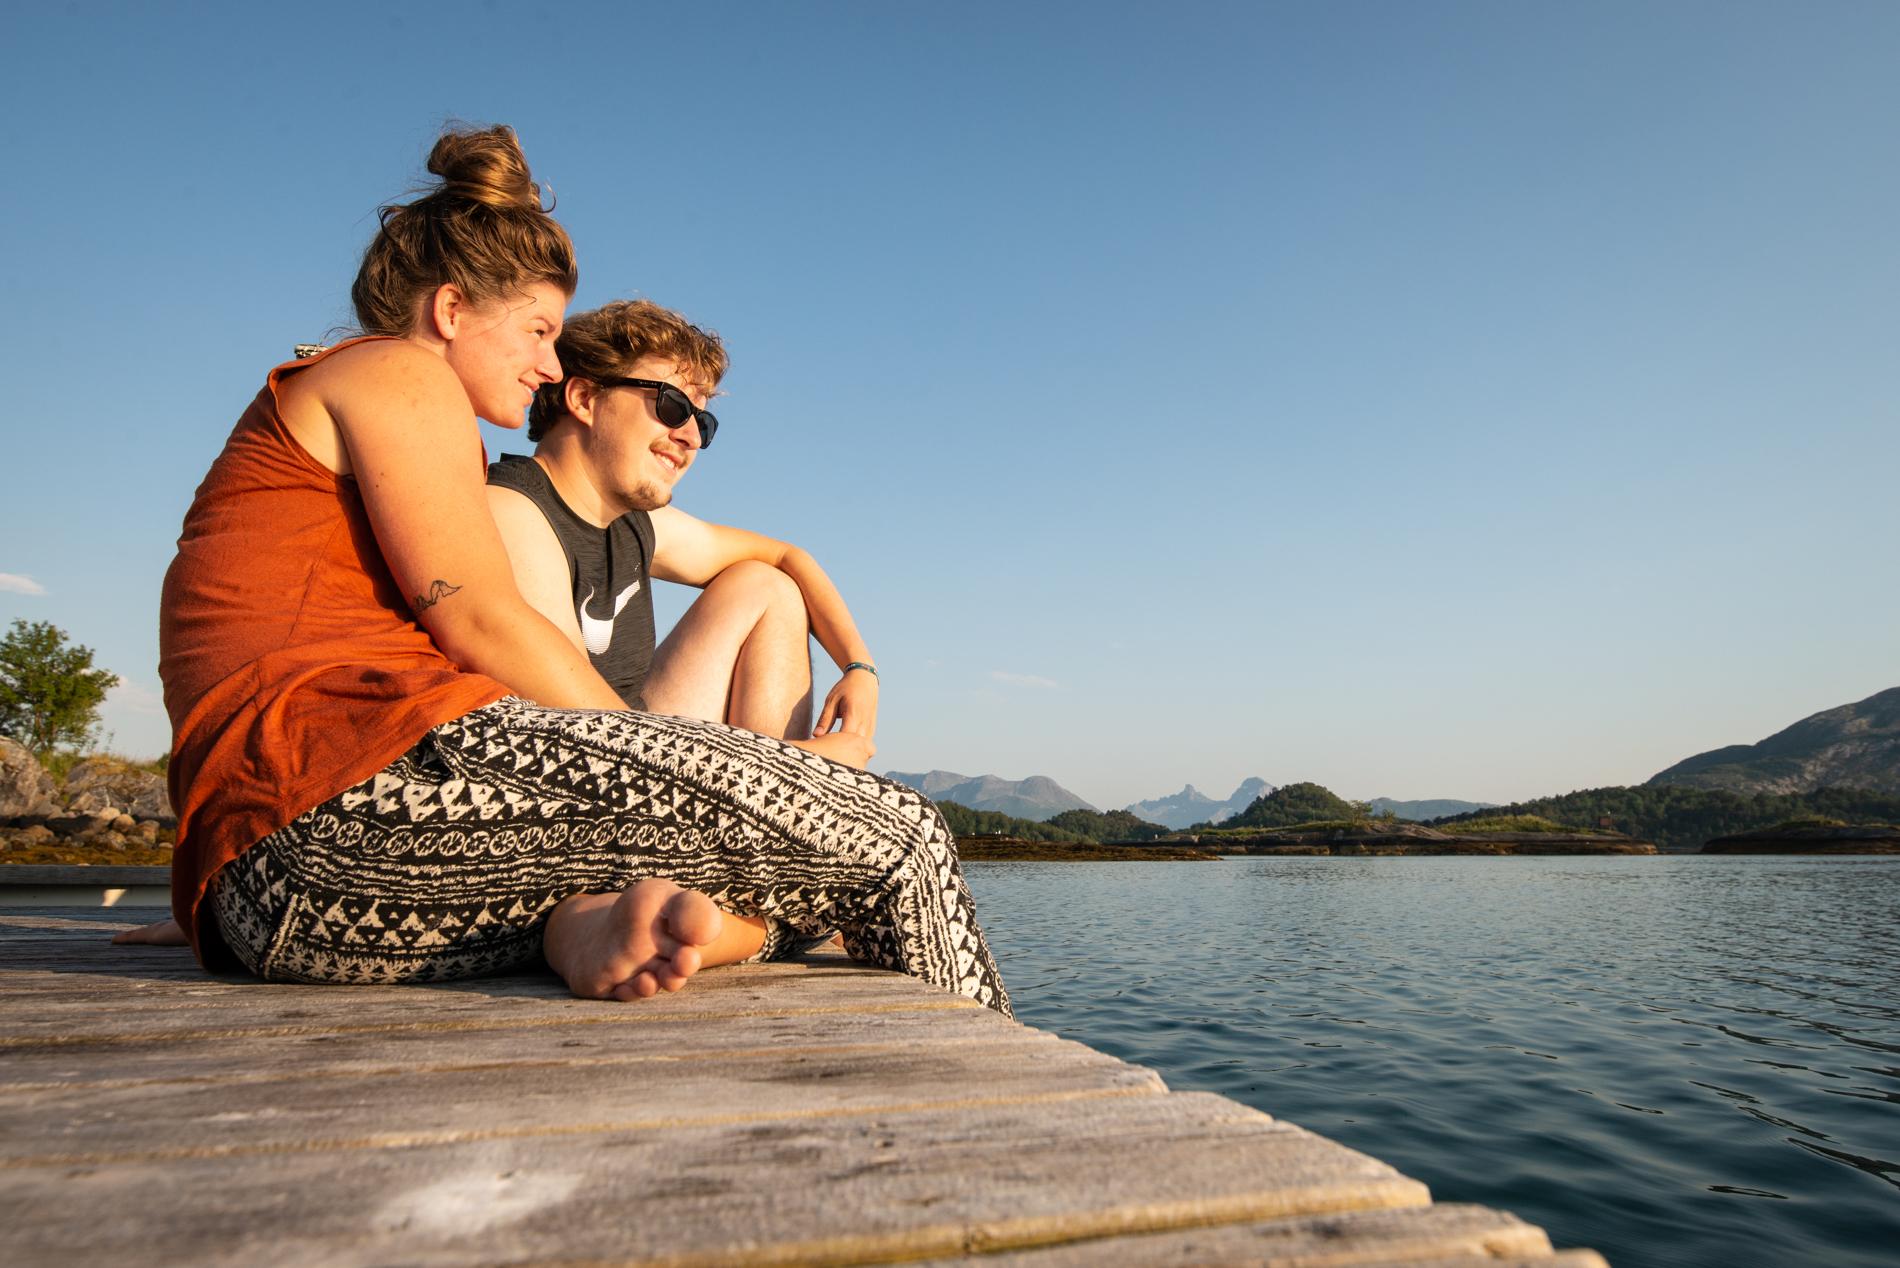 Ellisandme enjoying the sunset over the ocean of Nortdung Norway.